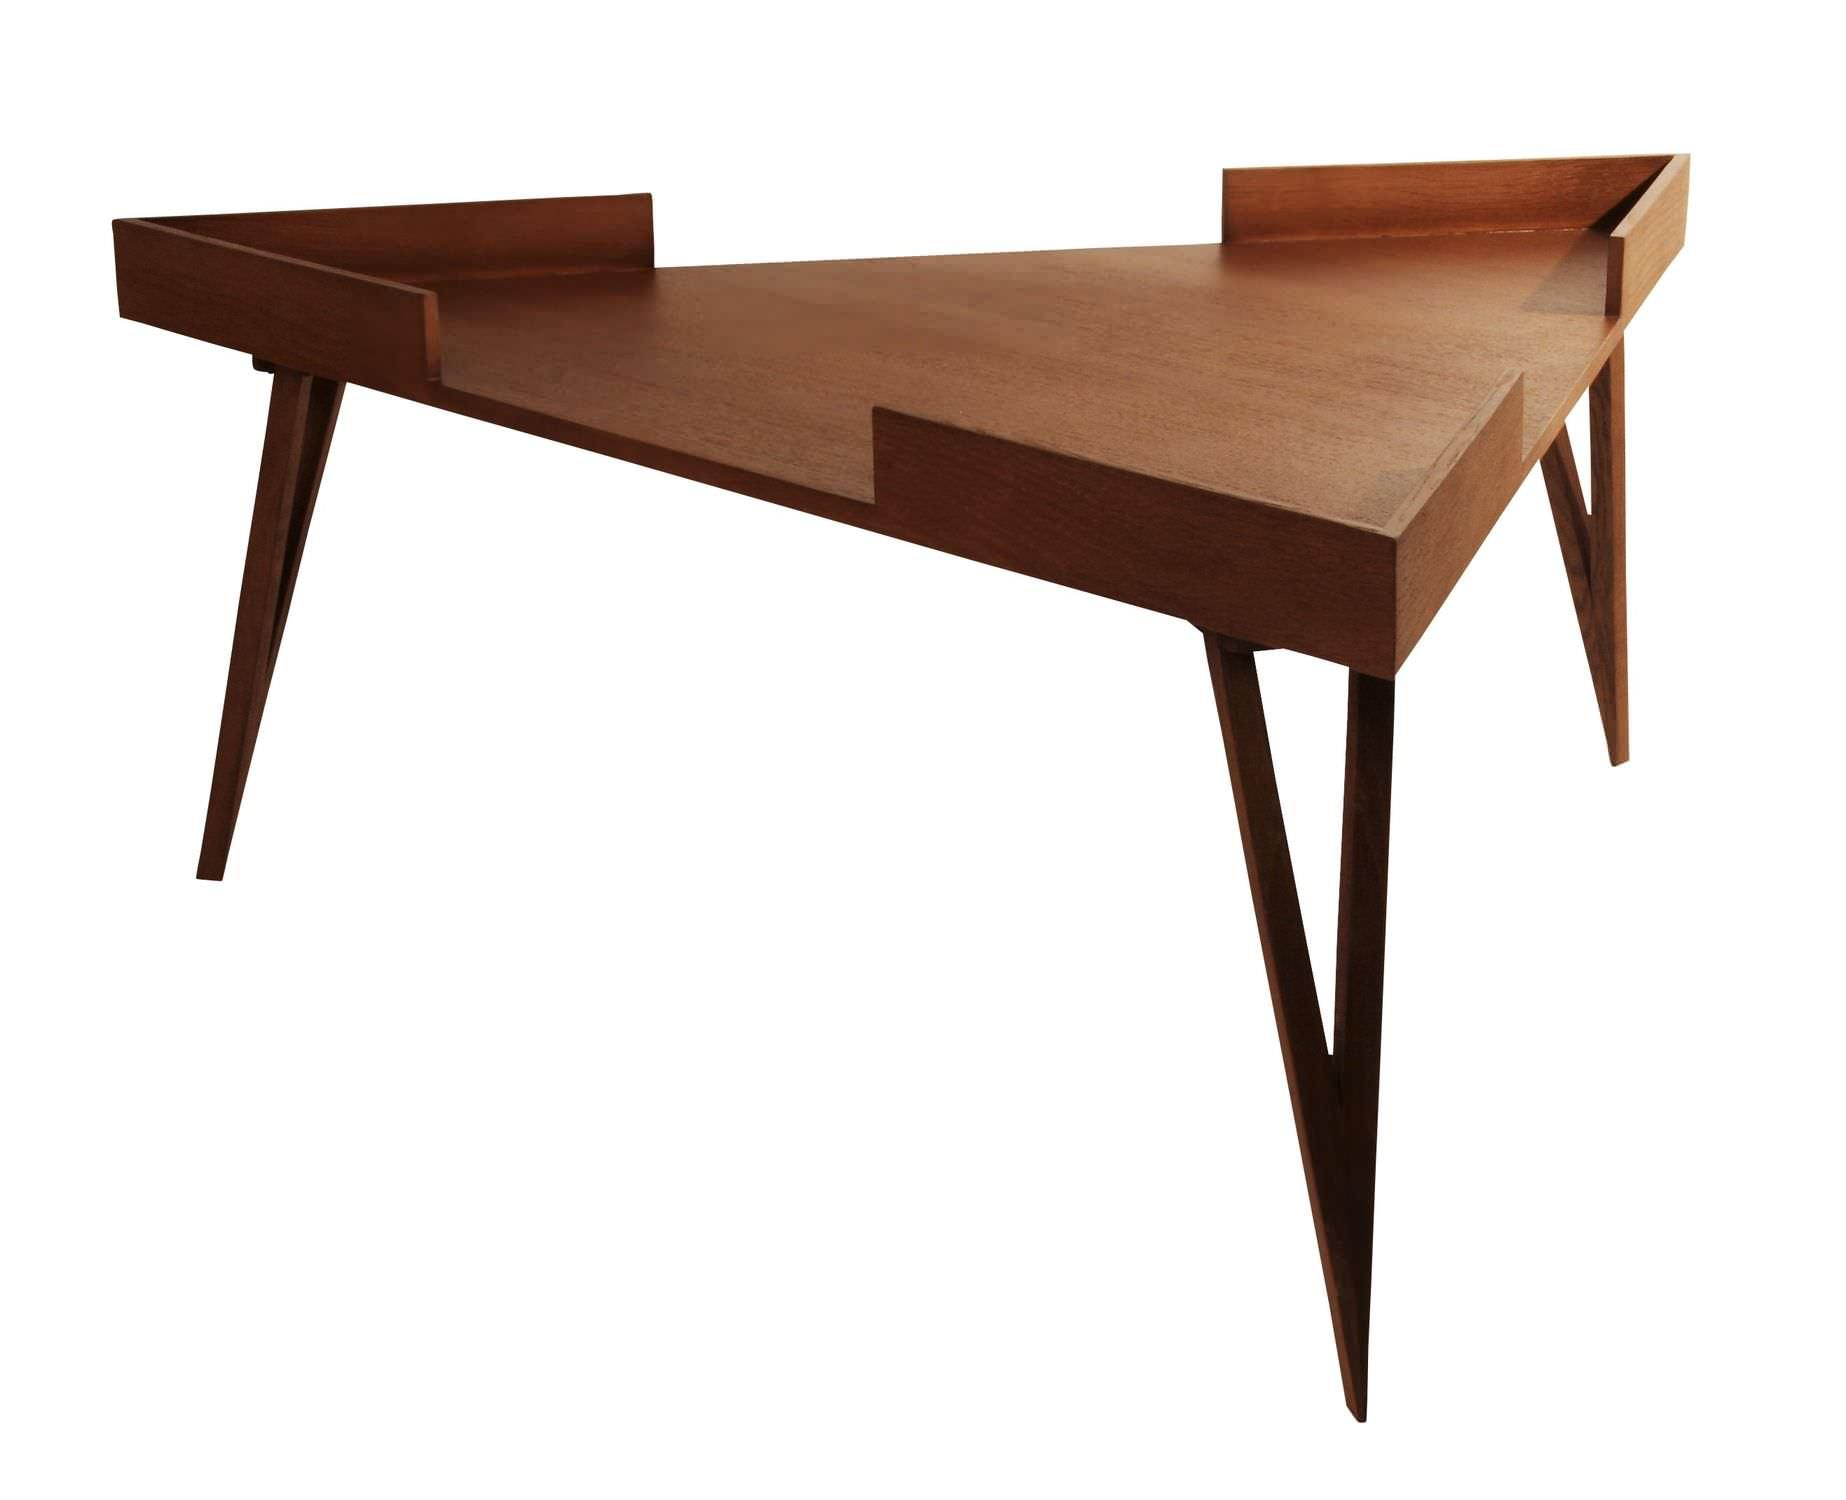 e069ea29c7733a Table basse contemporaine   en bois   triangulaire - TRIANGLE ...